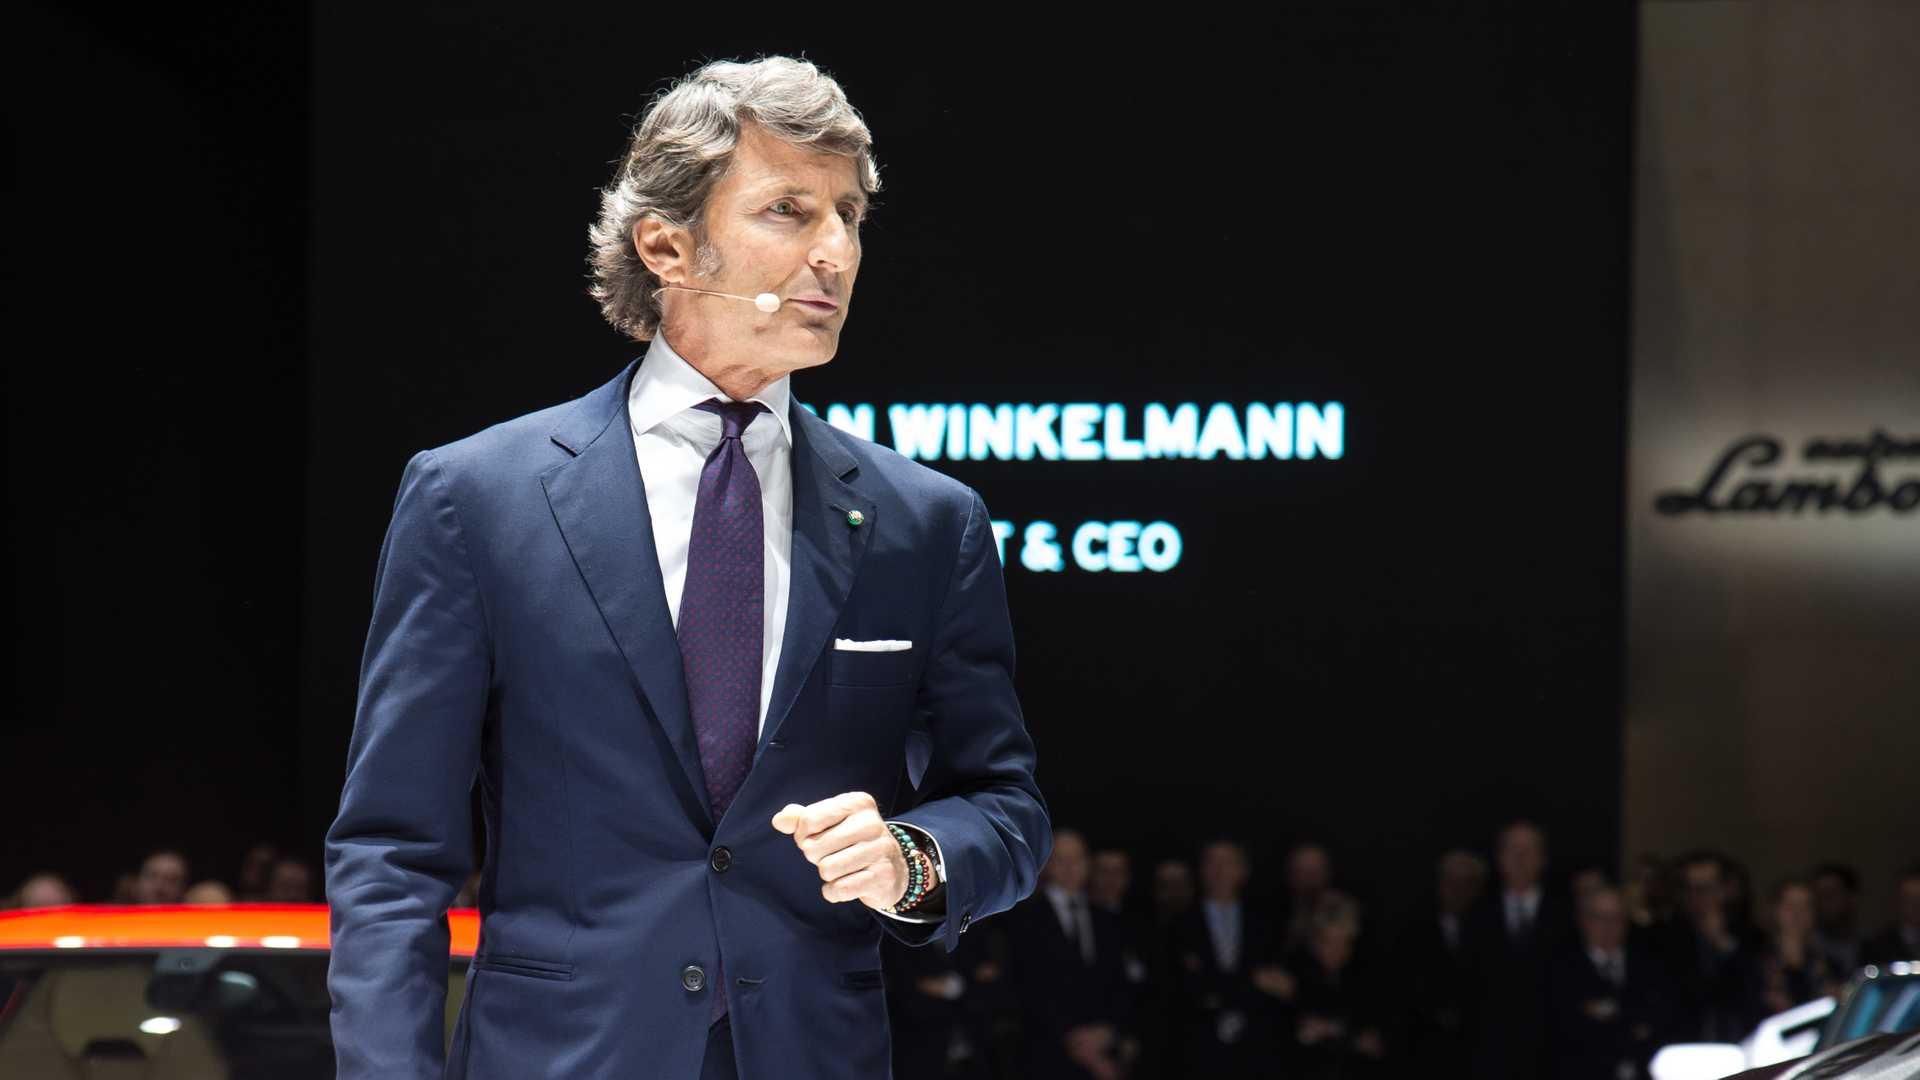 Stephan Winkelmann returns to the Lamborghini board